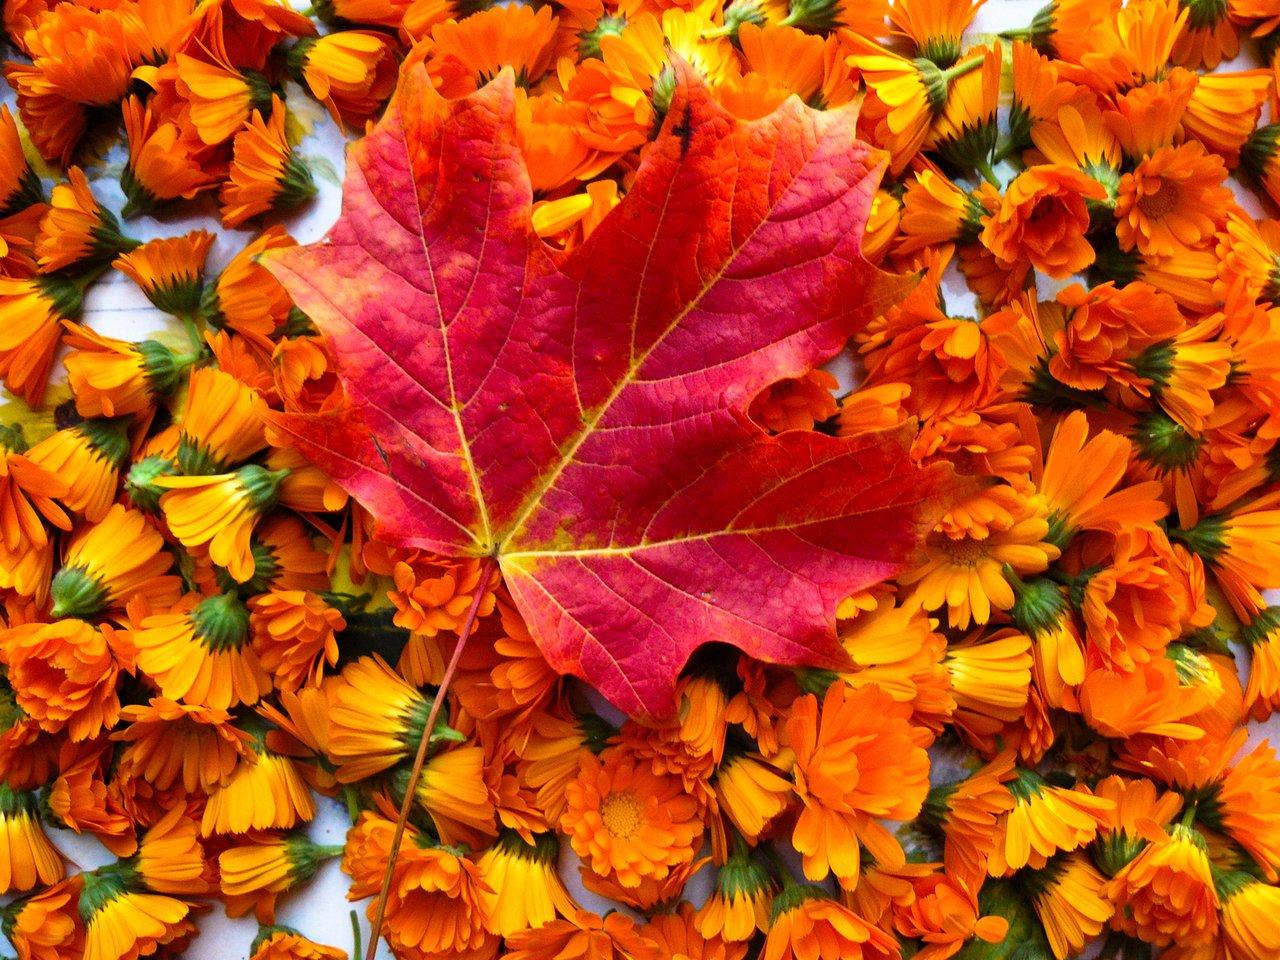 napkin rings inspired by autumn flowers flower press